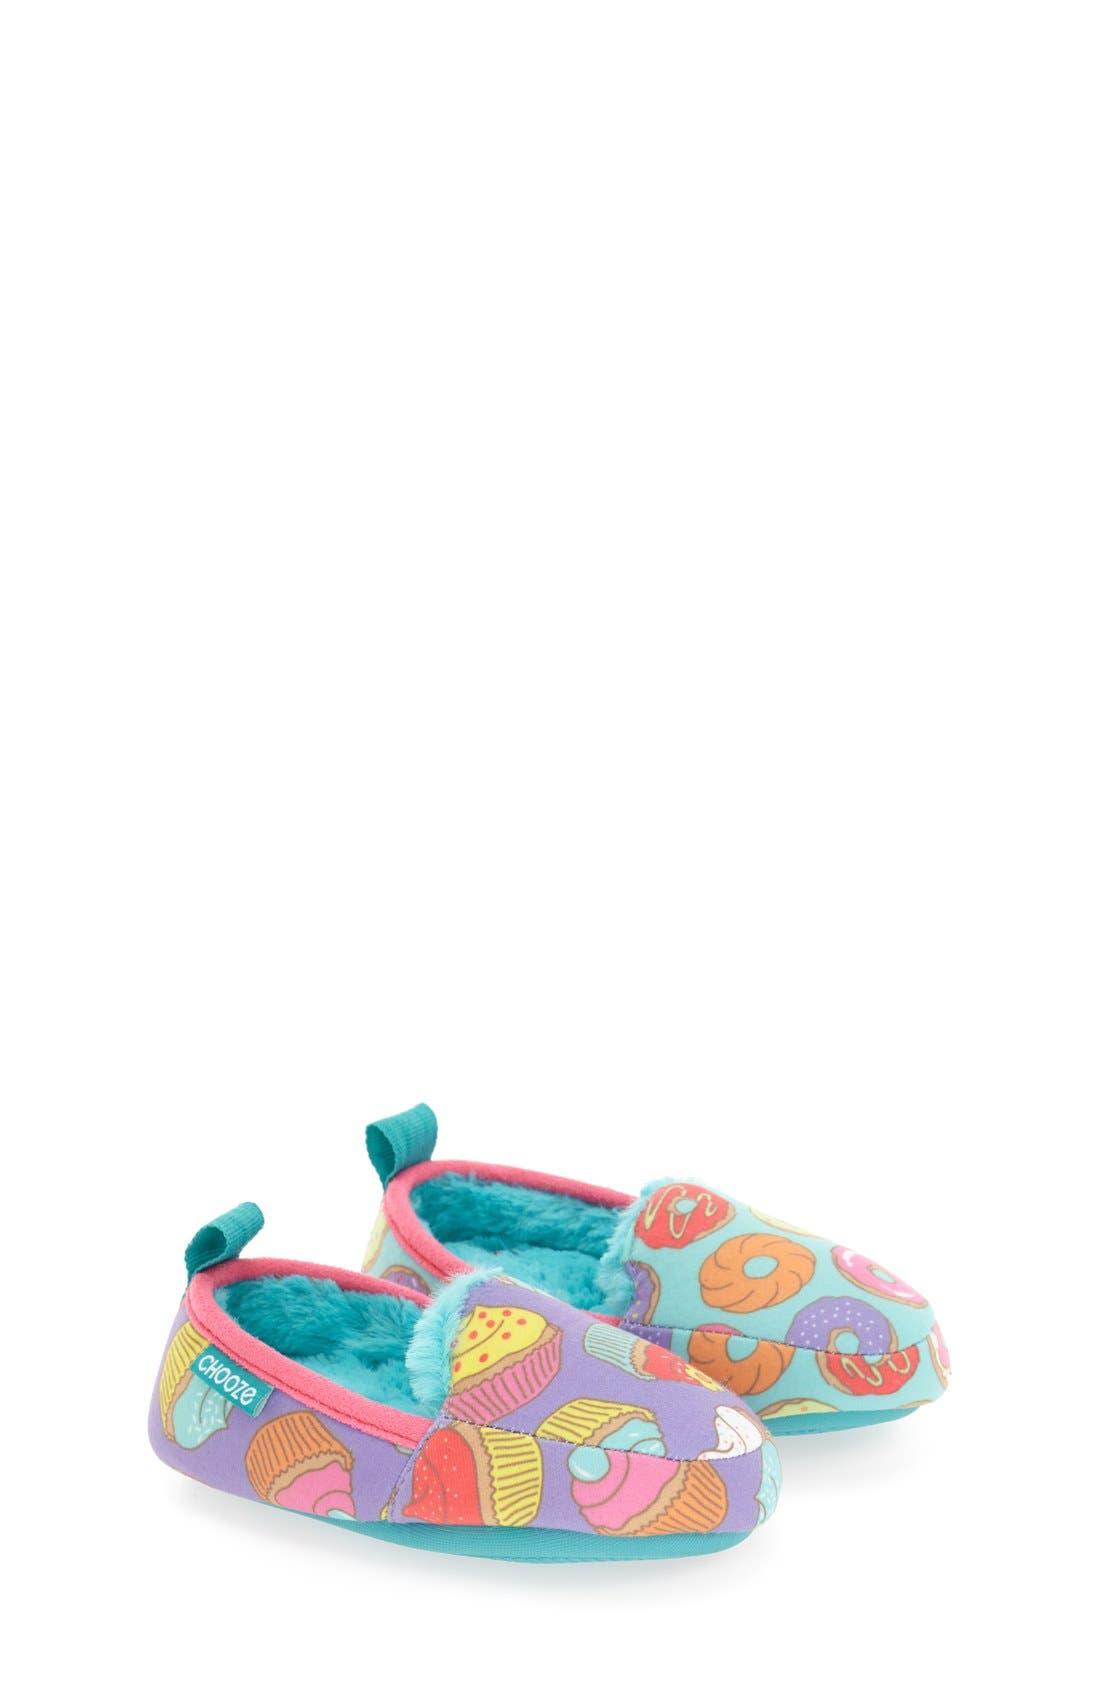 Main Image - CHOOZE 'Slumber' Slippers (Toddler, Little Kid & Big Kid)